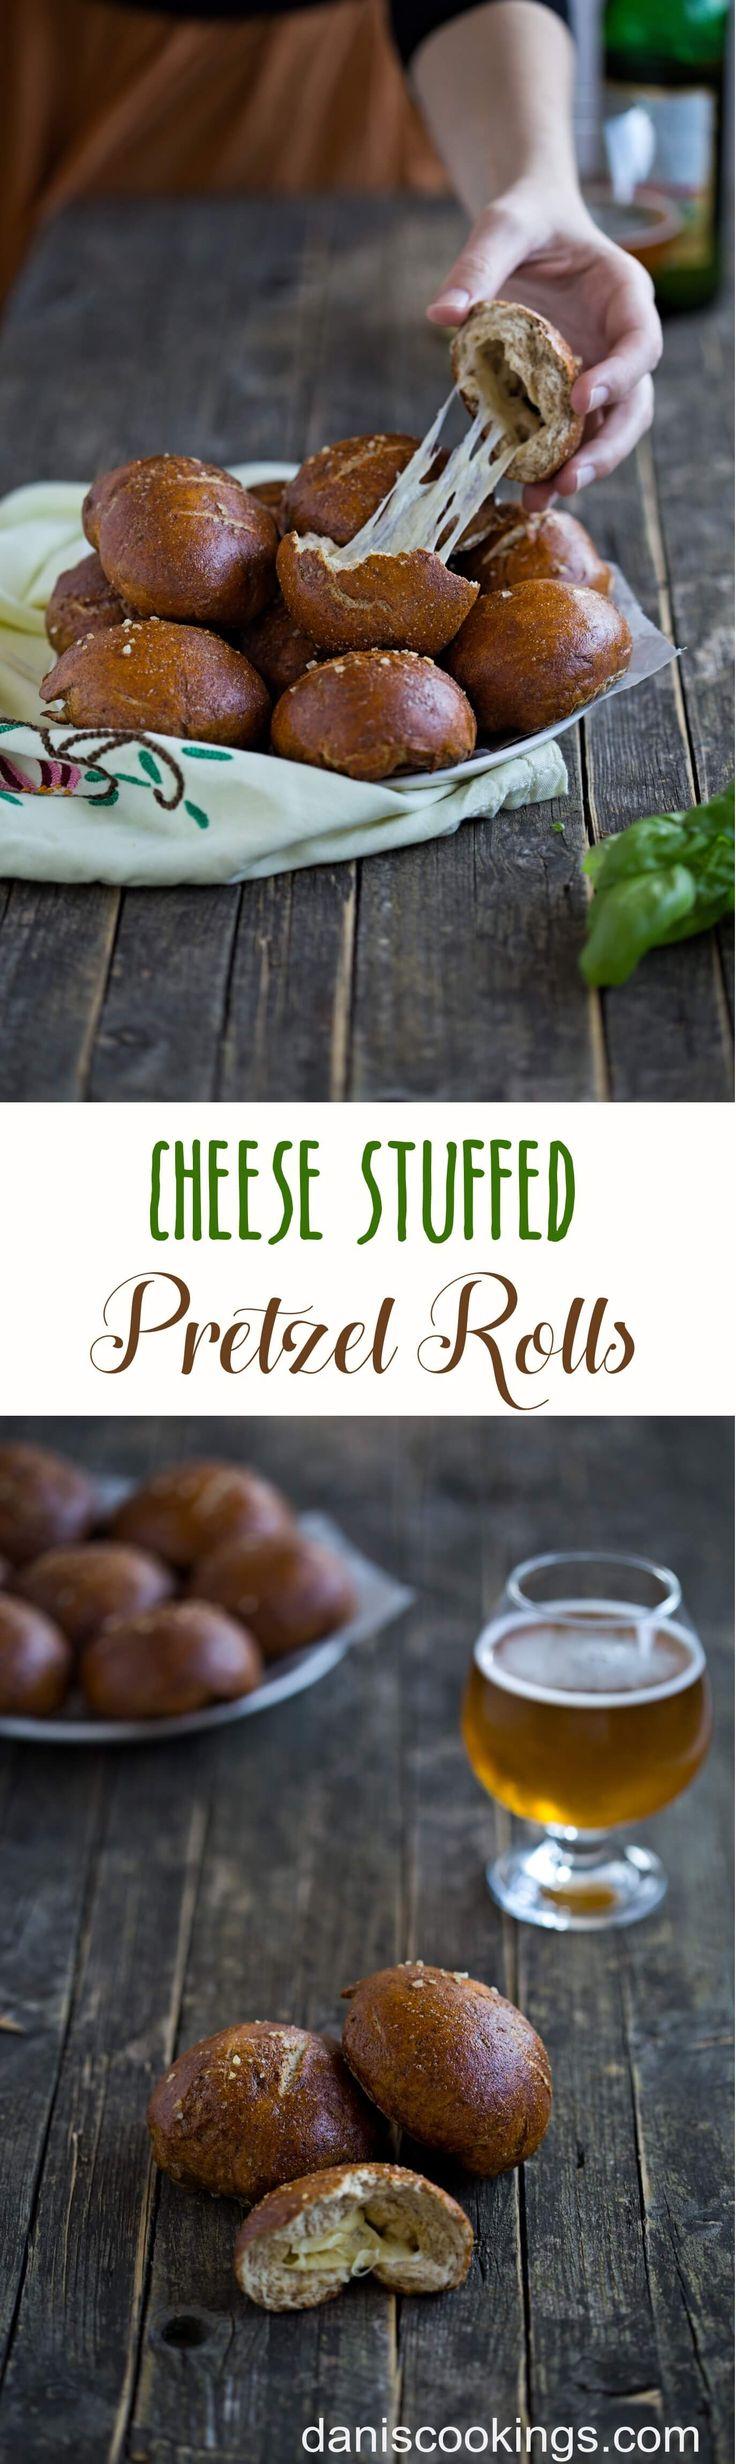 Easy to make homemade Cheese Stuffed Pretzel Rolls | Dani's Cookings blog